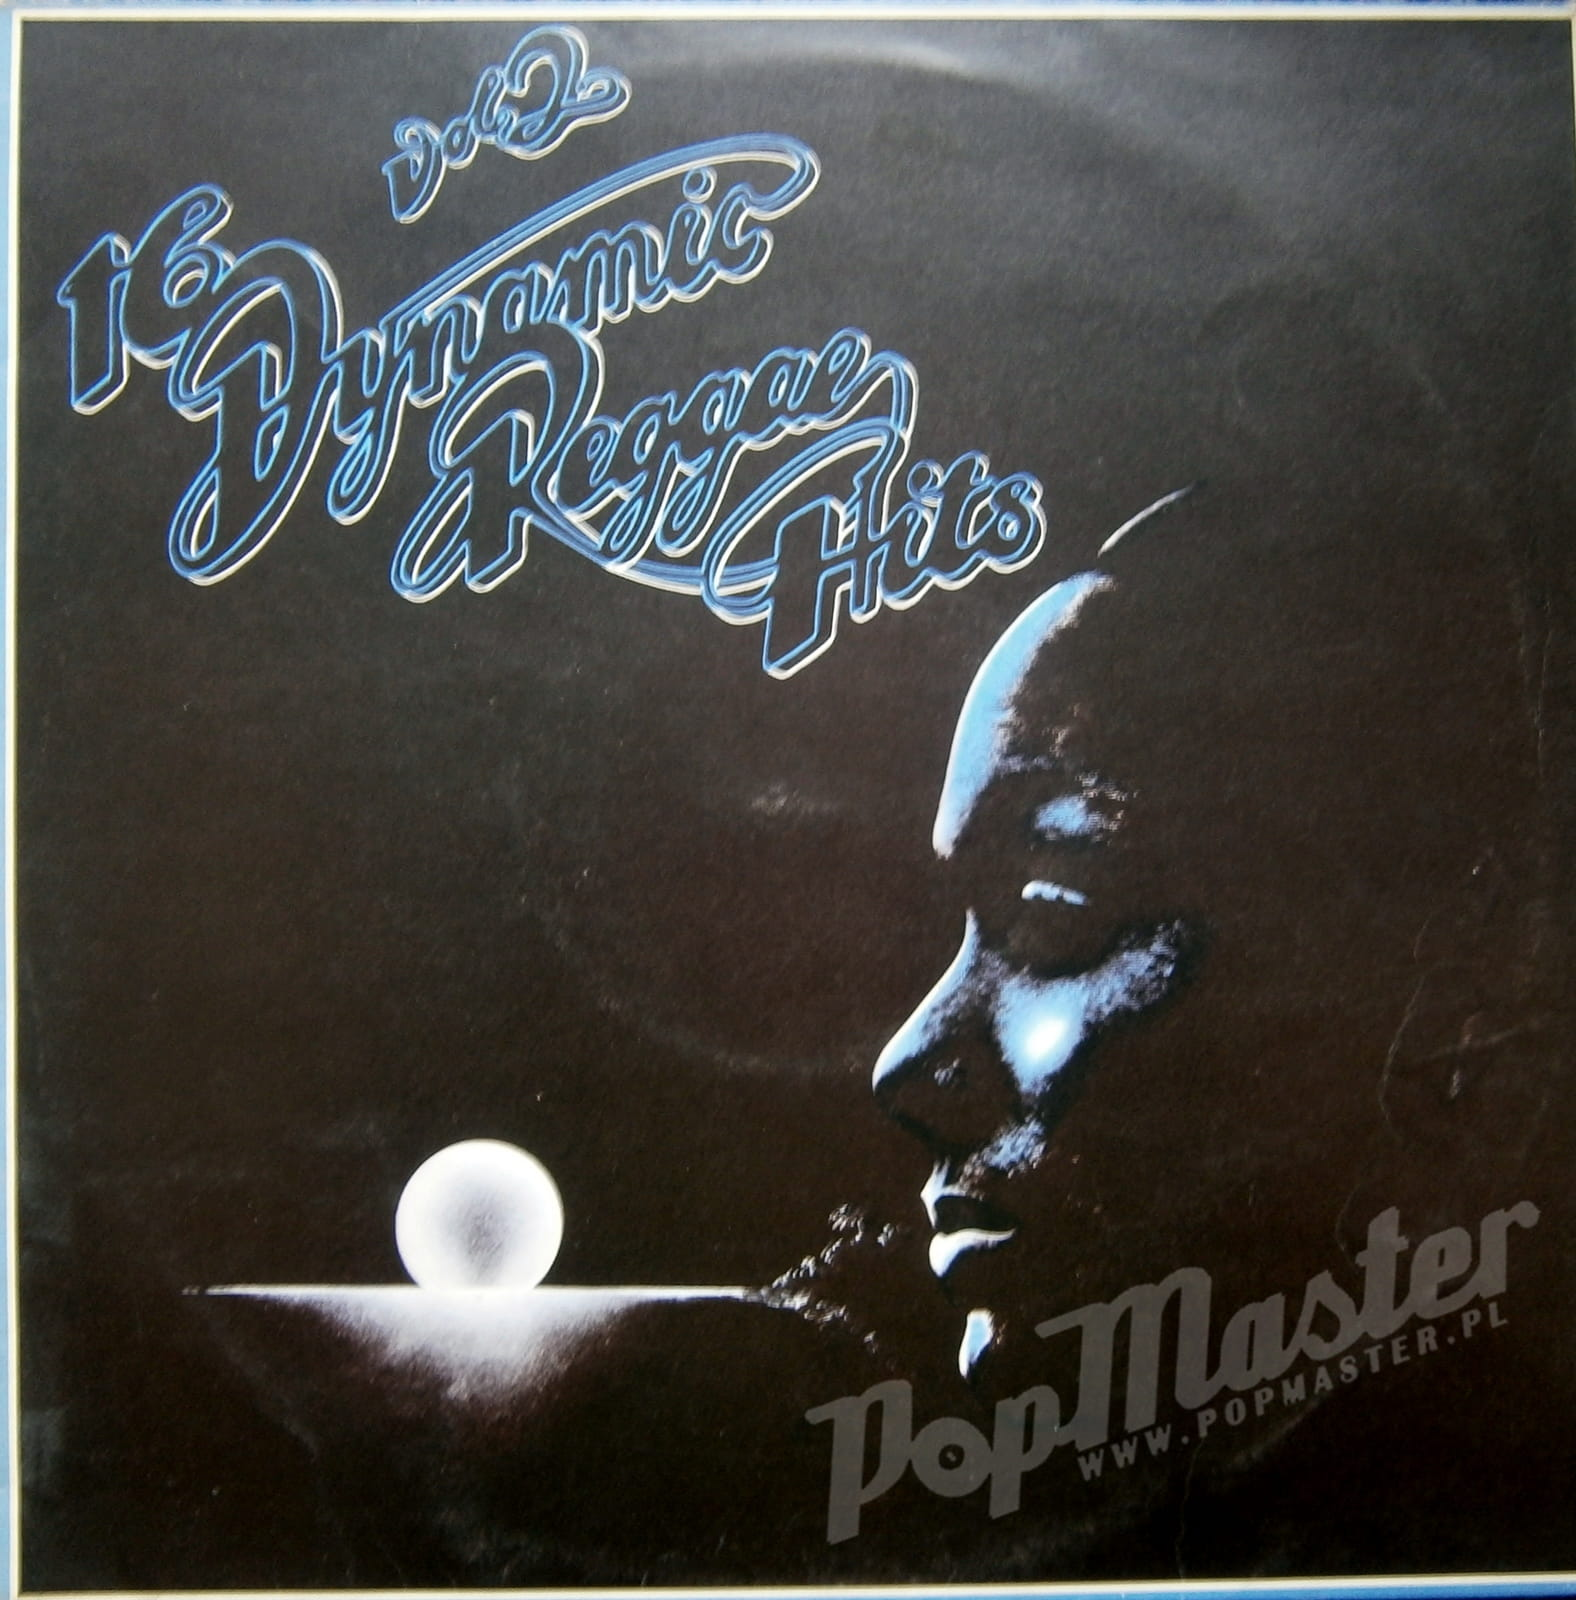 16 Dynamic Reggae Hits Vol 2 Trojan Tbl 209 Stereo